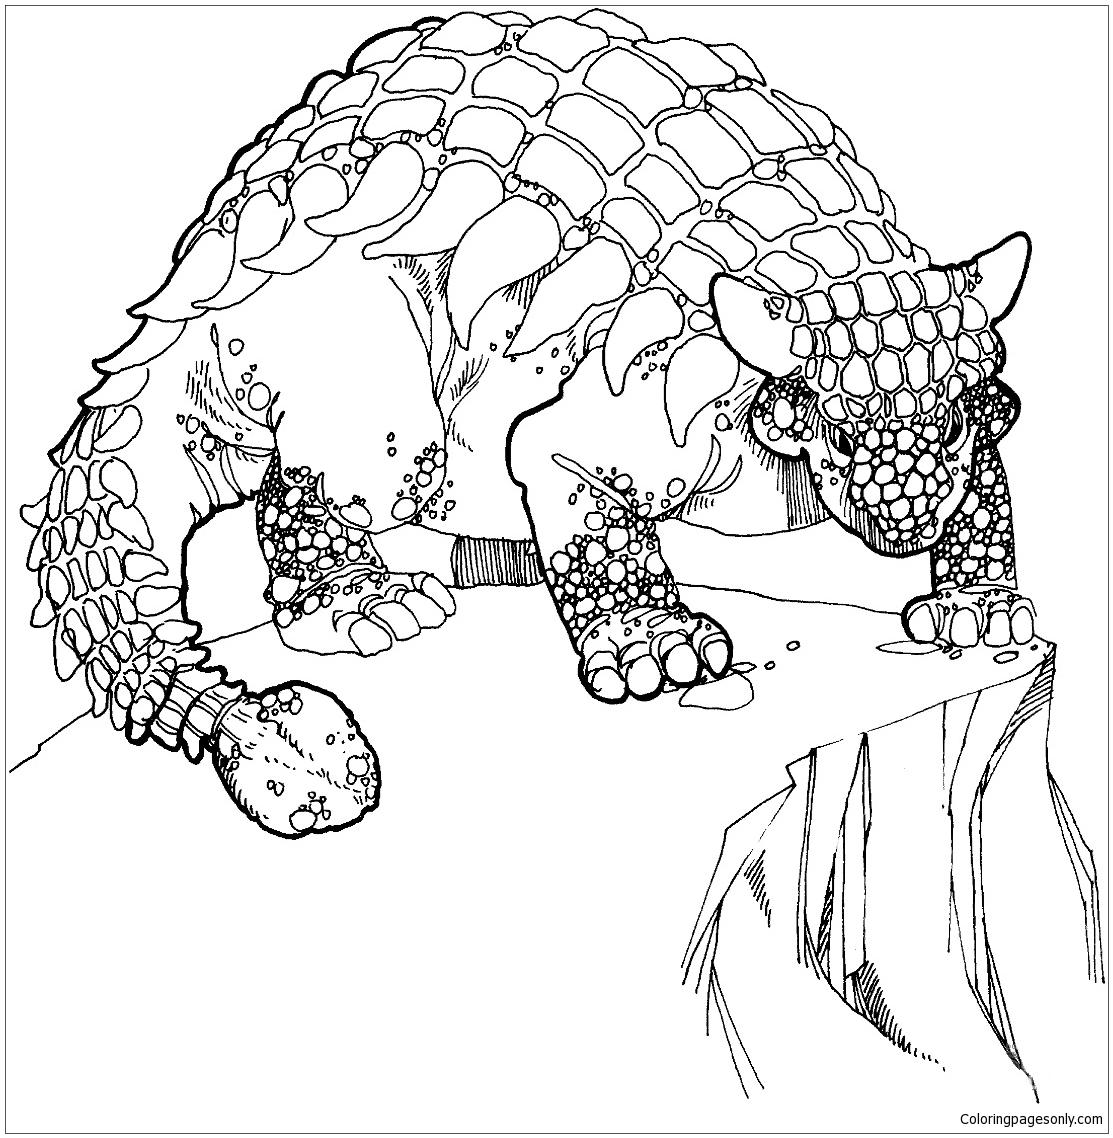 Ankylosaurus Cretaceous Period Dino Coloring Page